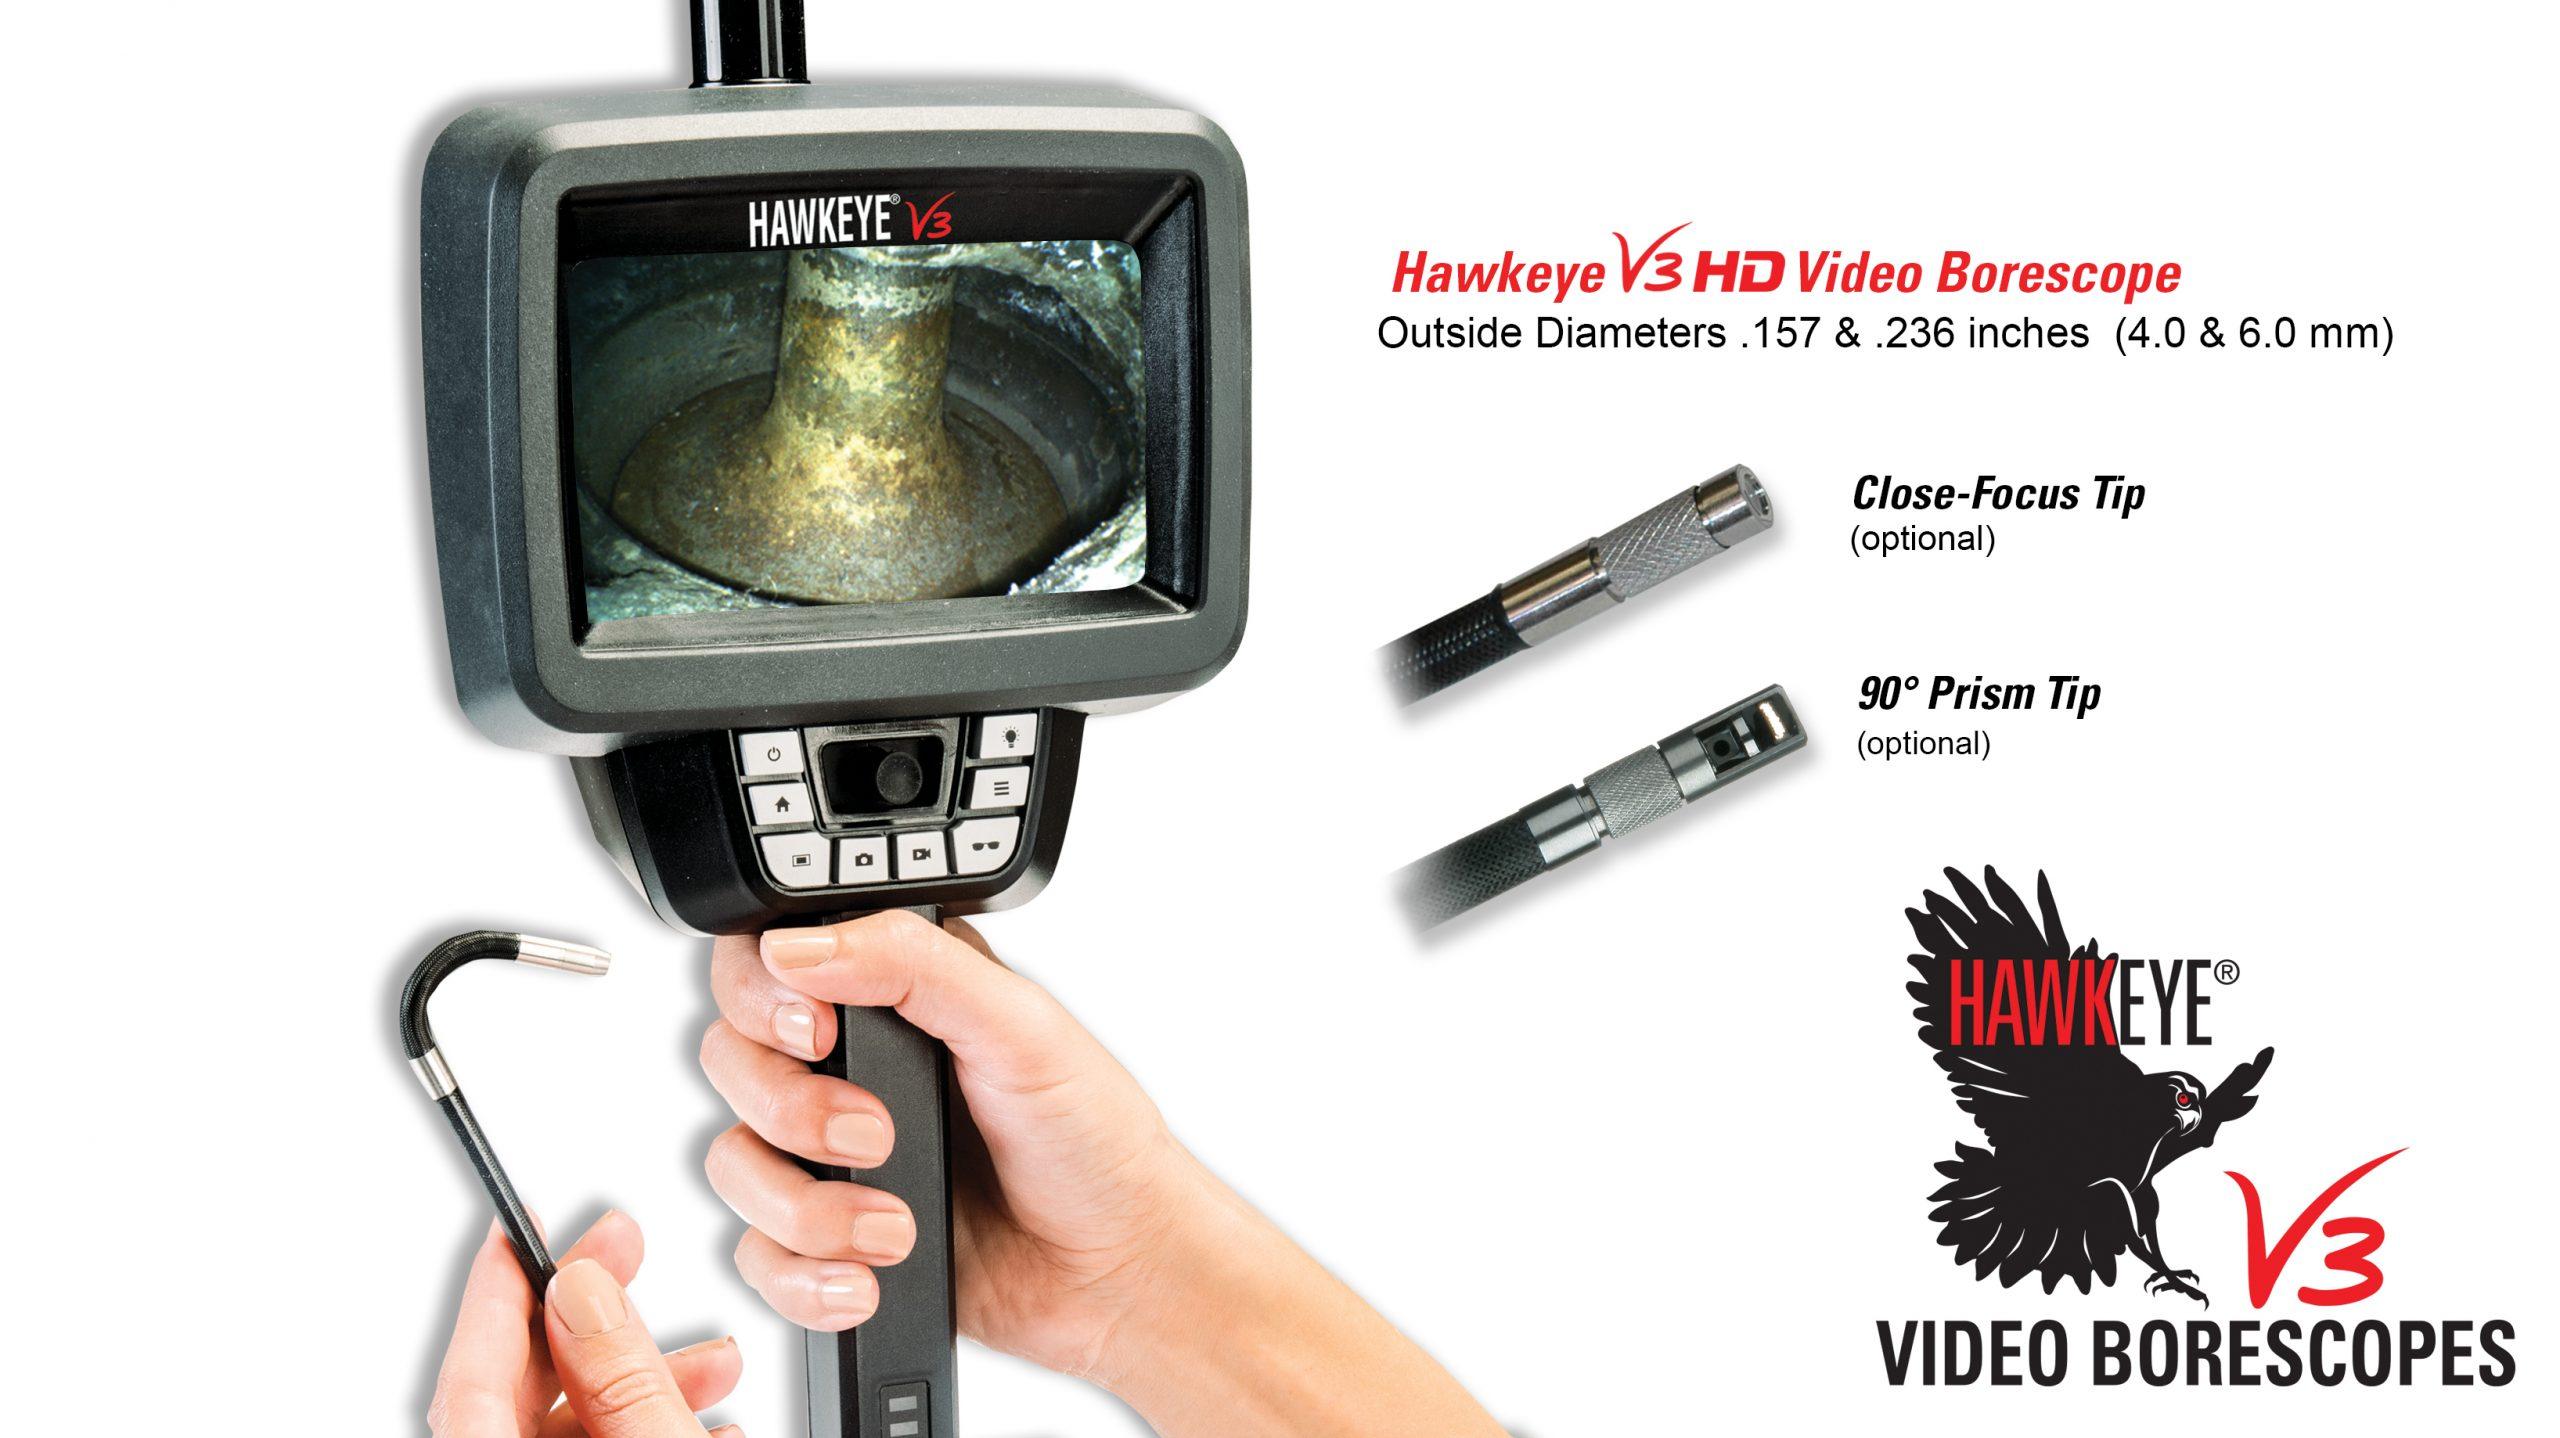 Link to Hawkeye® V3 HD Video Borescopes